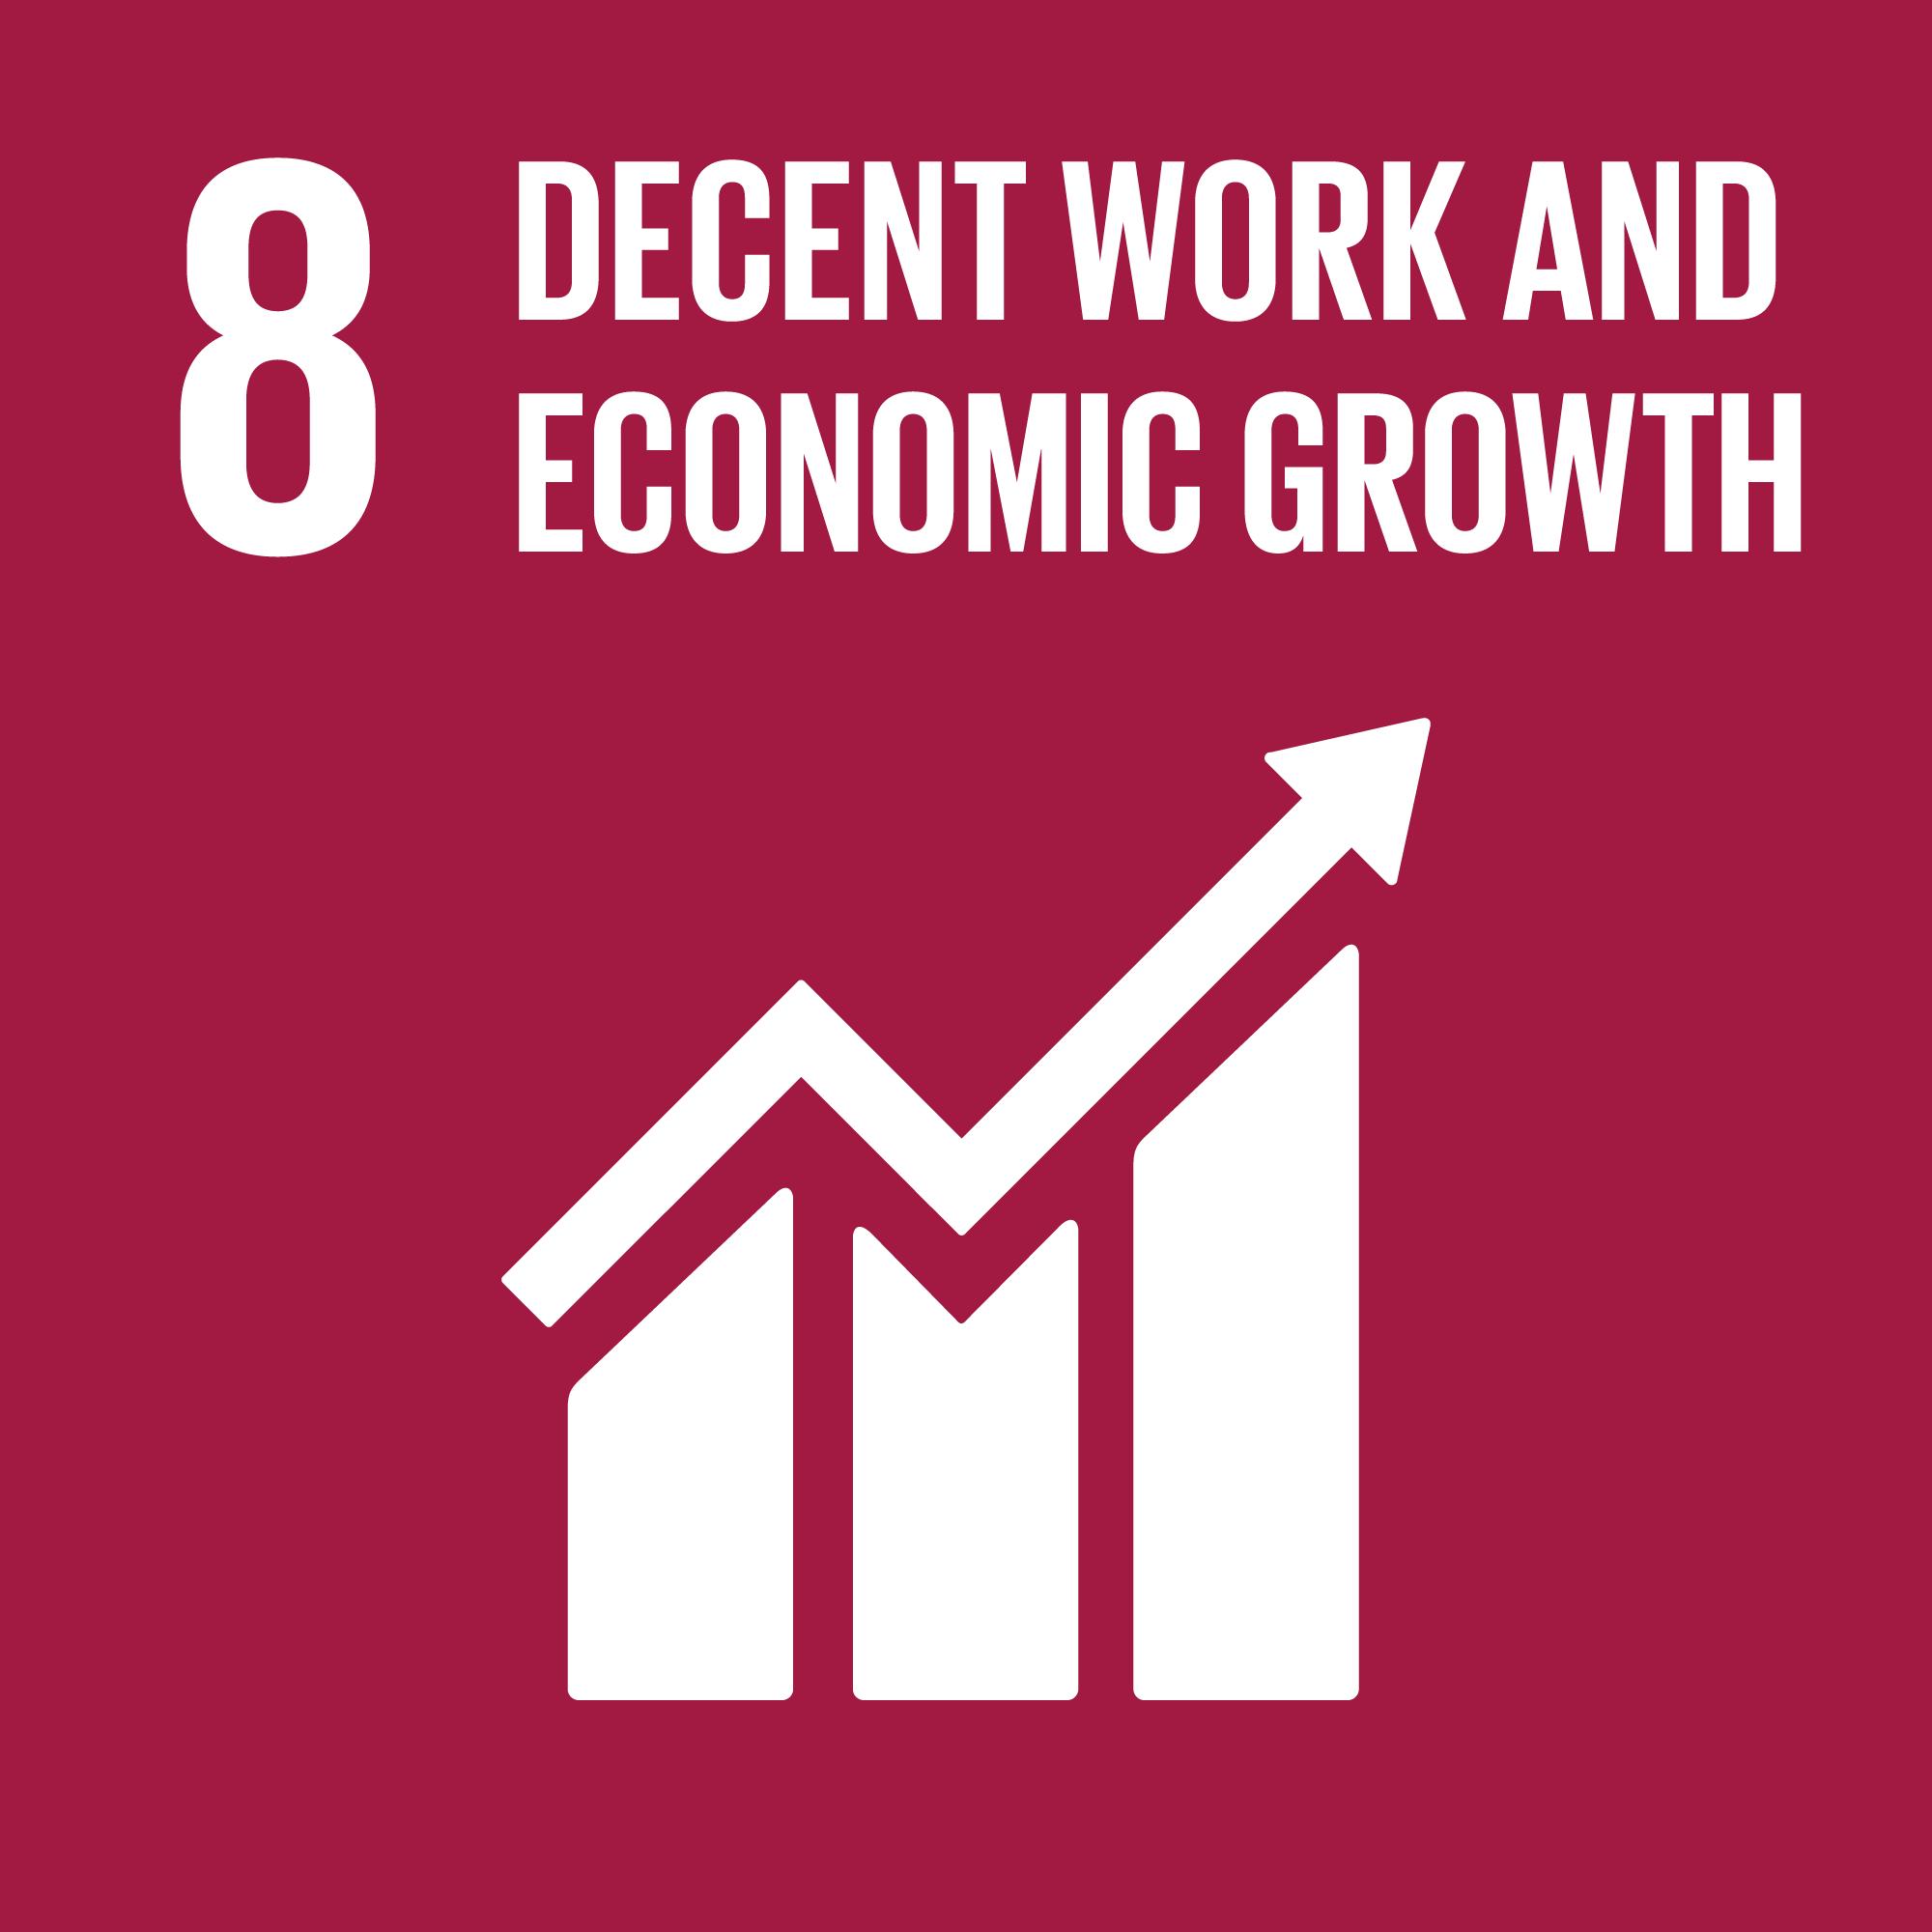 Sustainable Development Goal 8 | Decent work & economic growth